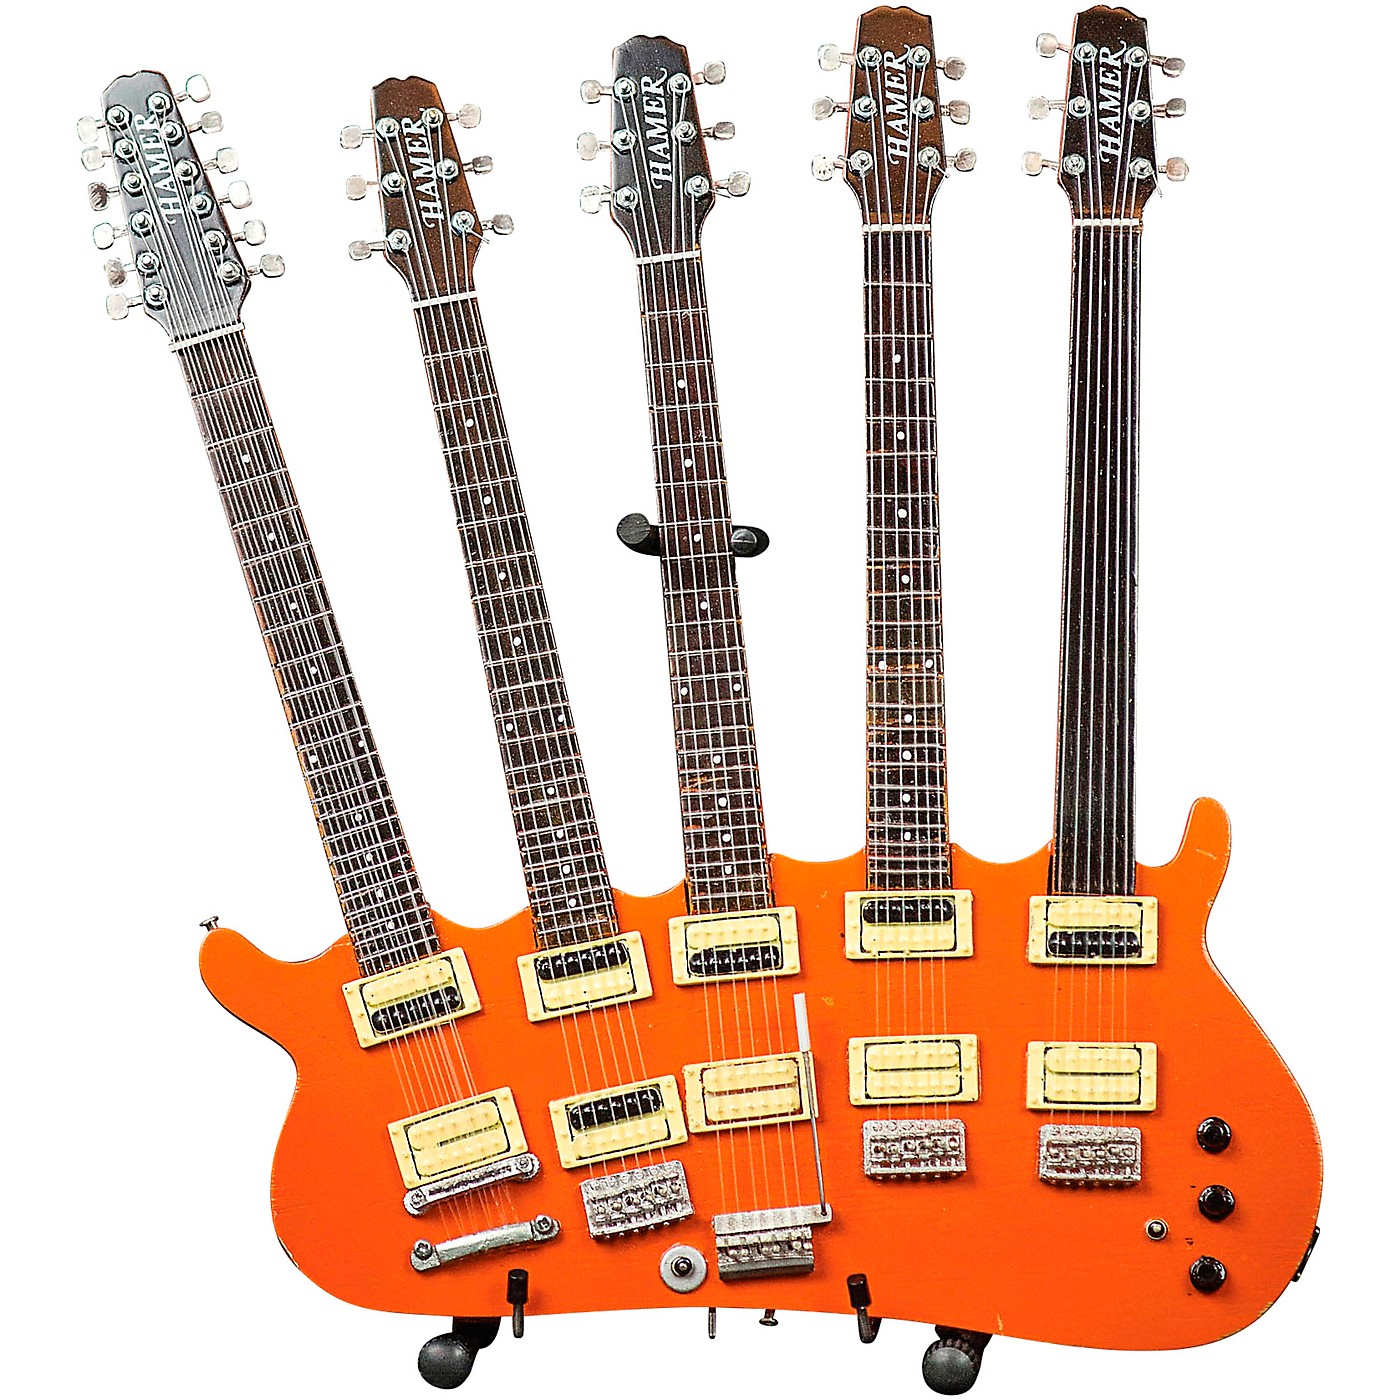 Hal Leonard Rick Nielsen 5-Neck Orange Monster Model Miniature Guitar Replica thumbnail